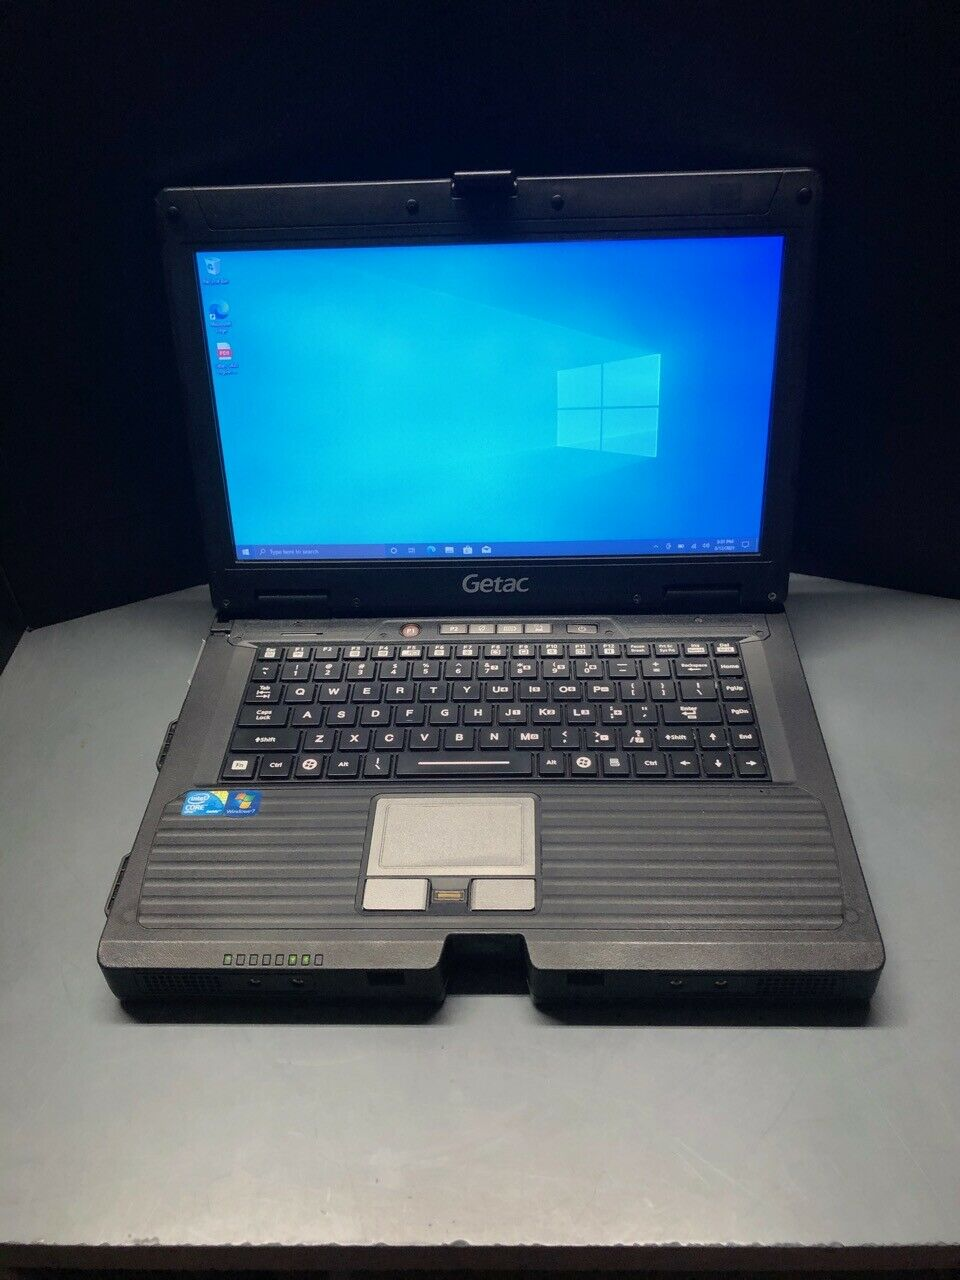 GETAC S400 -- i5 2.60GHz, 128GB SSD, 8GB RAM, Backlit Keyboa